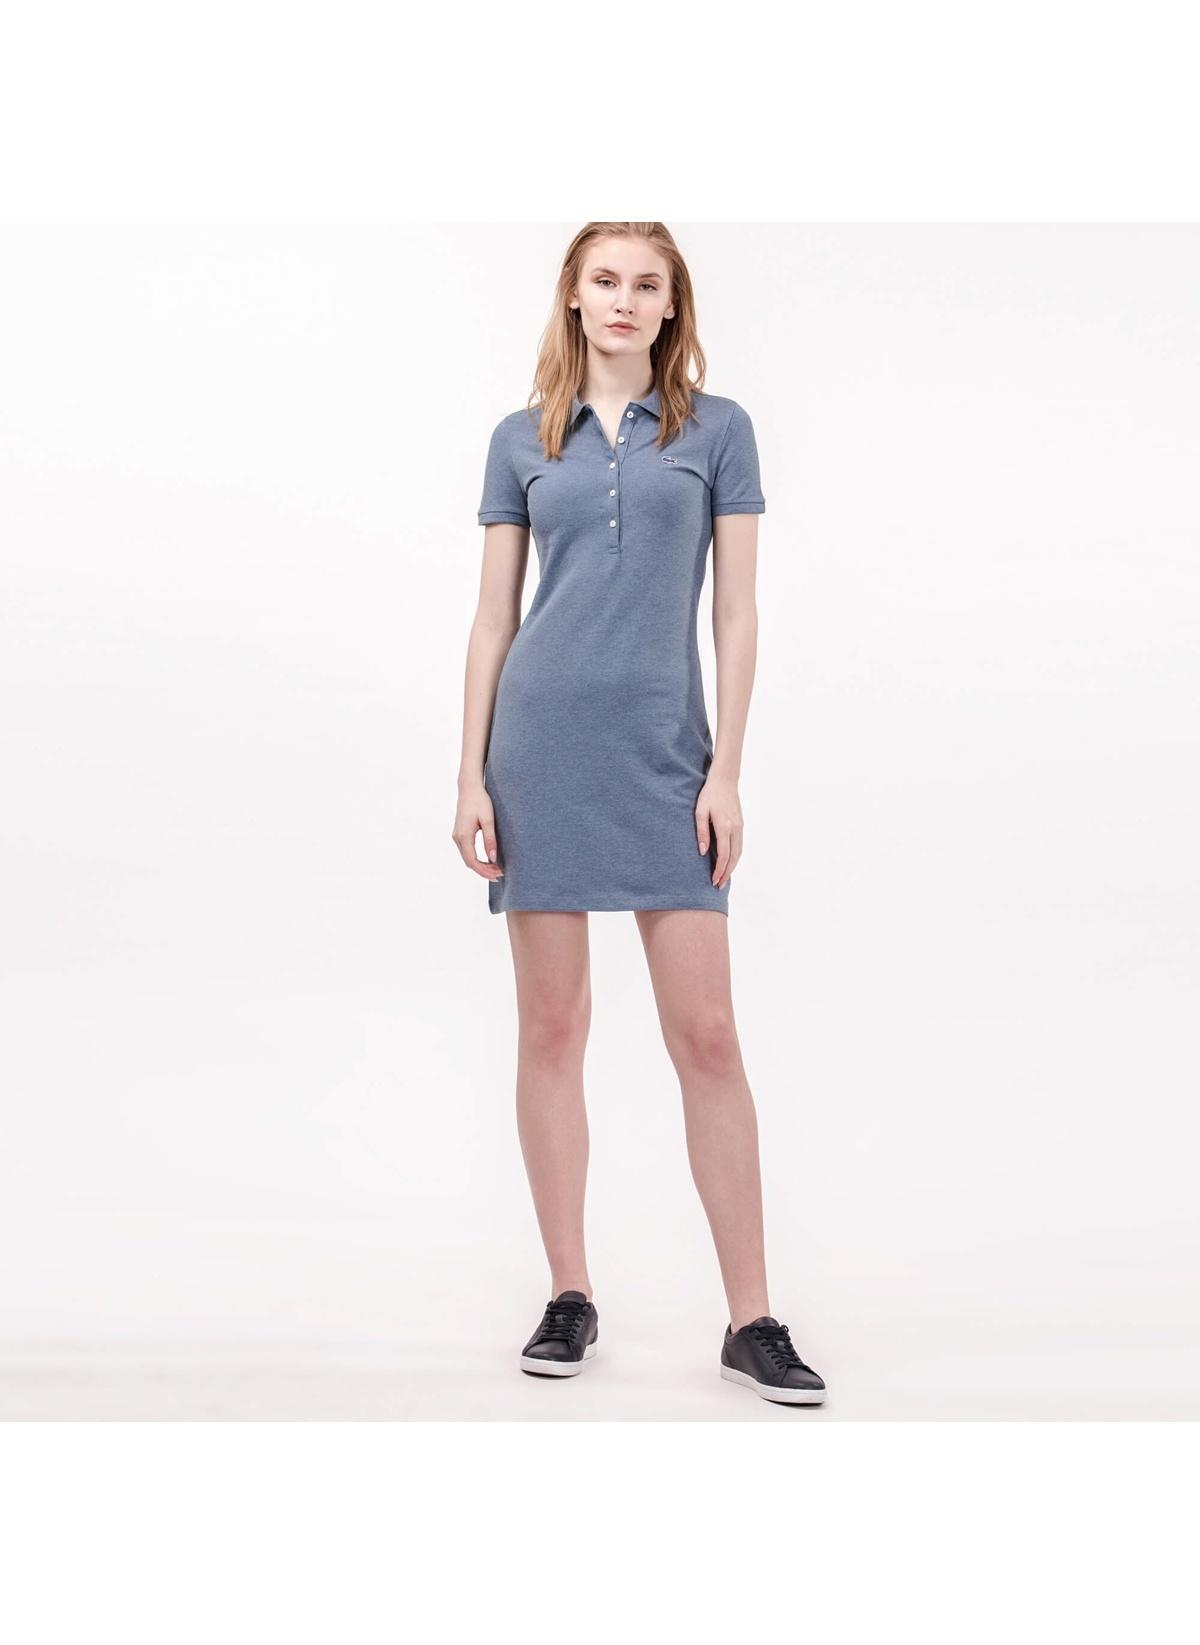 9790c799de45e Lacoste Kadın Kısa Kollu Mini Elbise renkli | Morhipo | 21006014